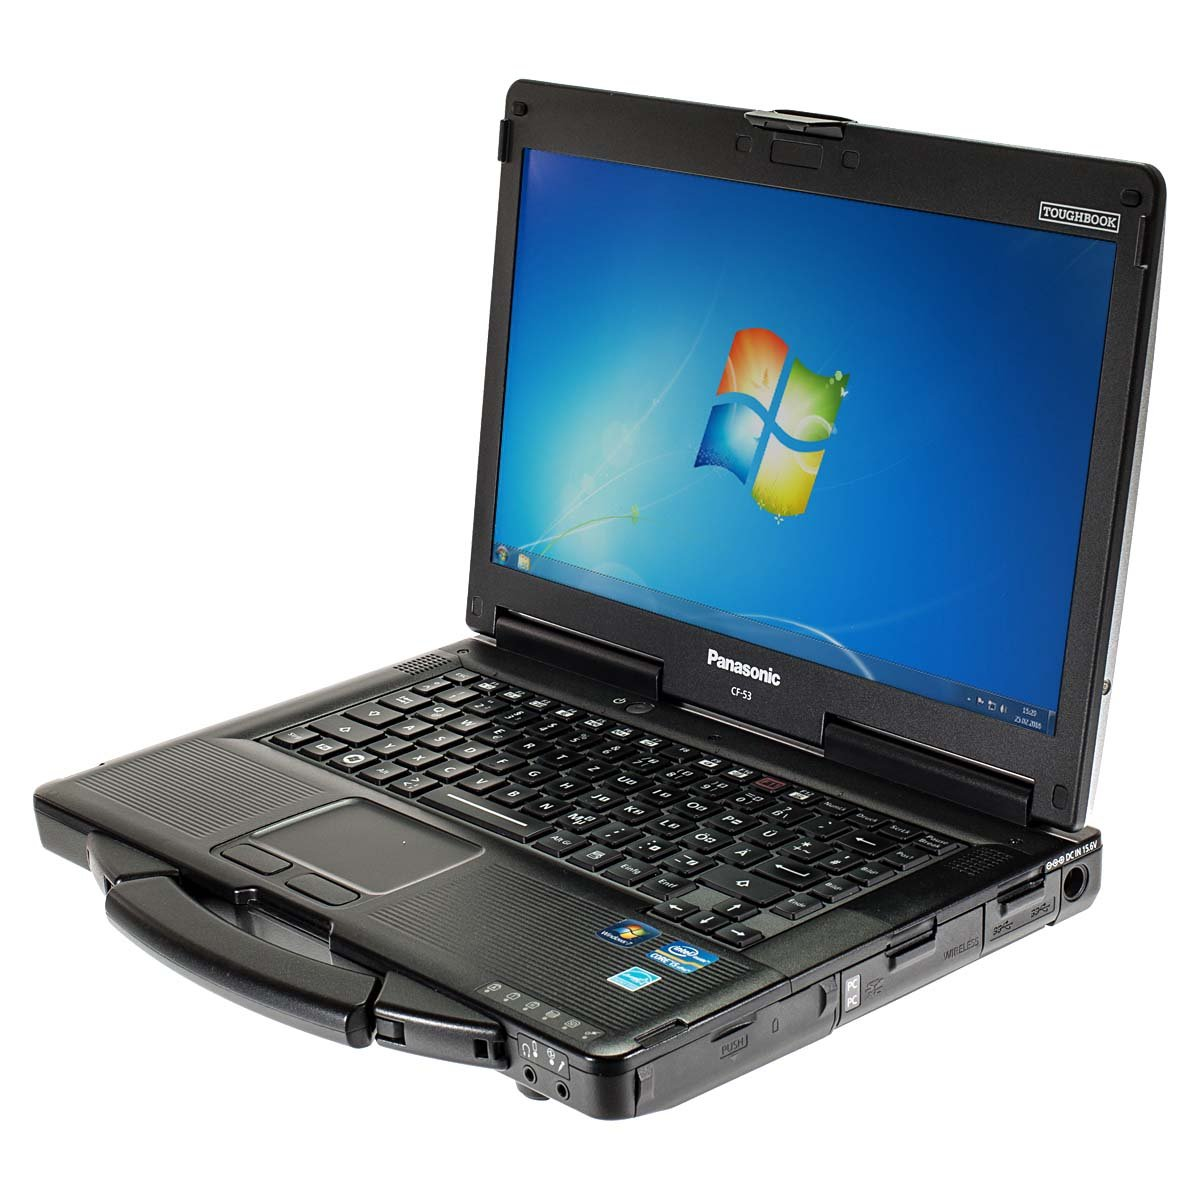 Outdoor portátil Panasonic ToughBook CF-53 i5 2,6 GHz 14 Pulgadas 256 GB SSD Windows7: Amazon.es: Informática